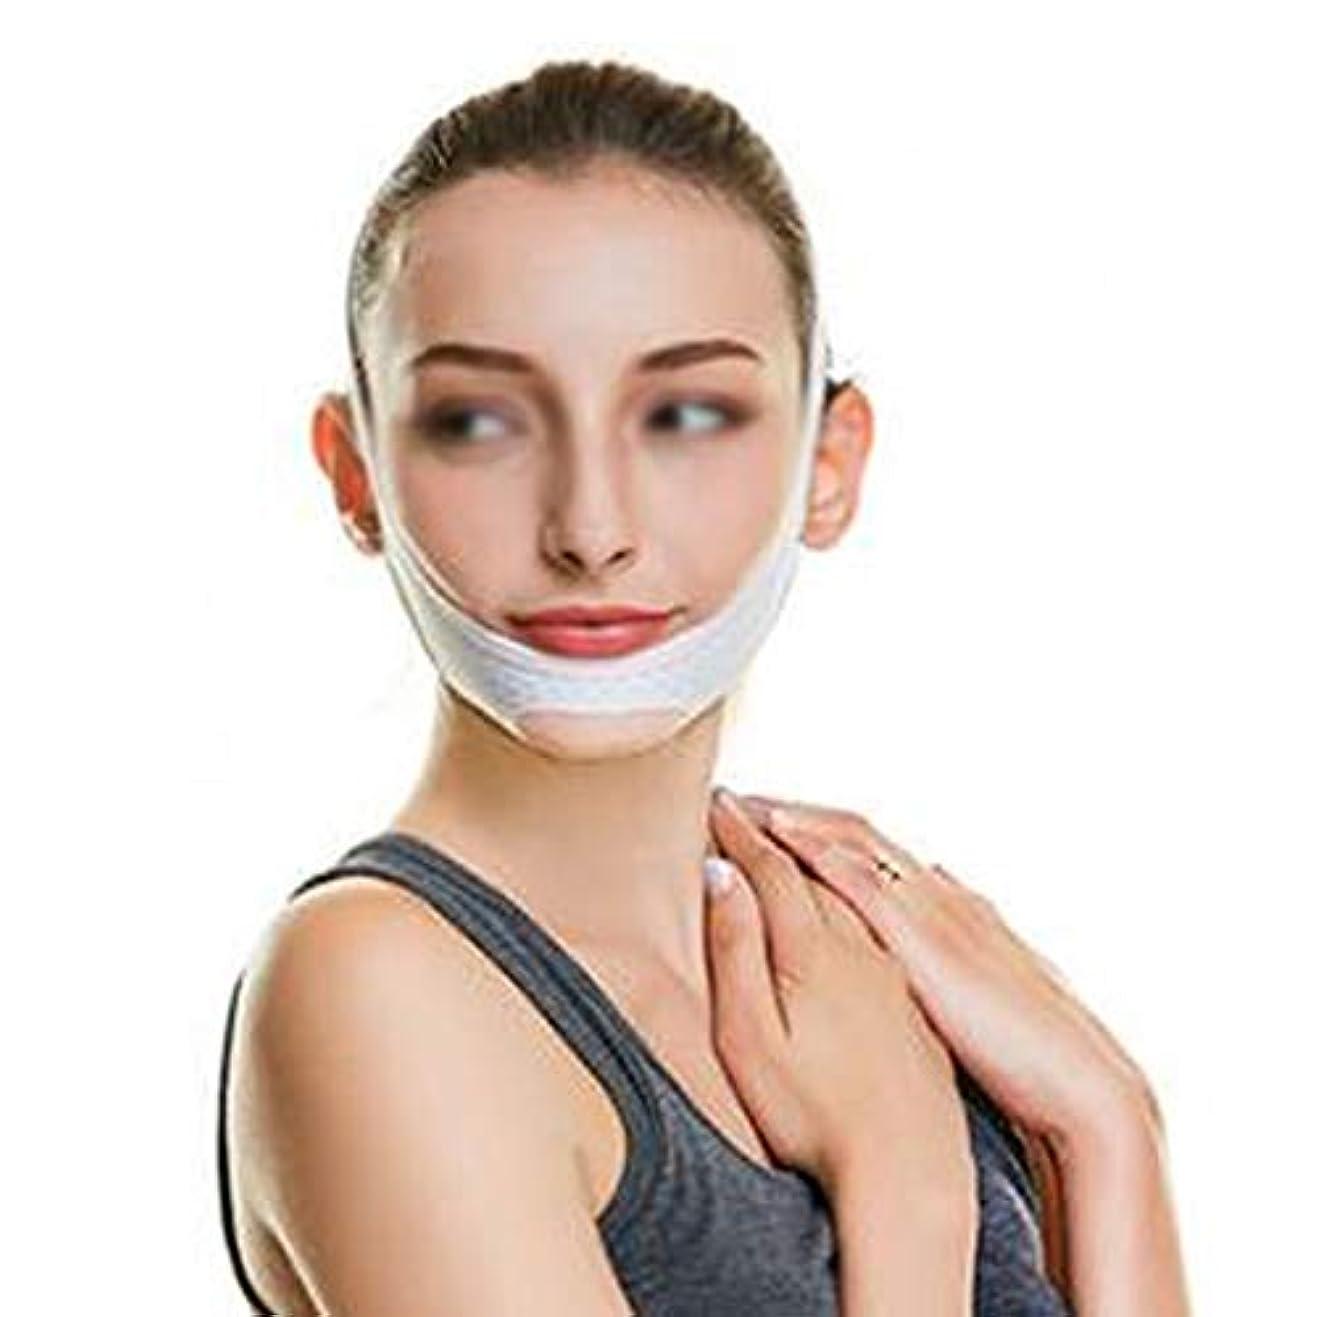 ZWBD フェイスマスク, Vフェイスアーティファクトメロンフェイスバンデージマスクを使用した薄顔